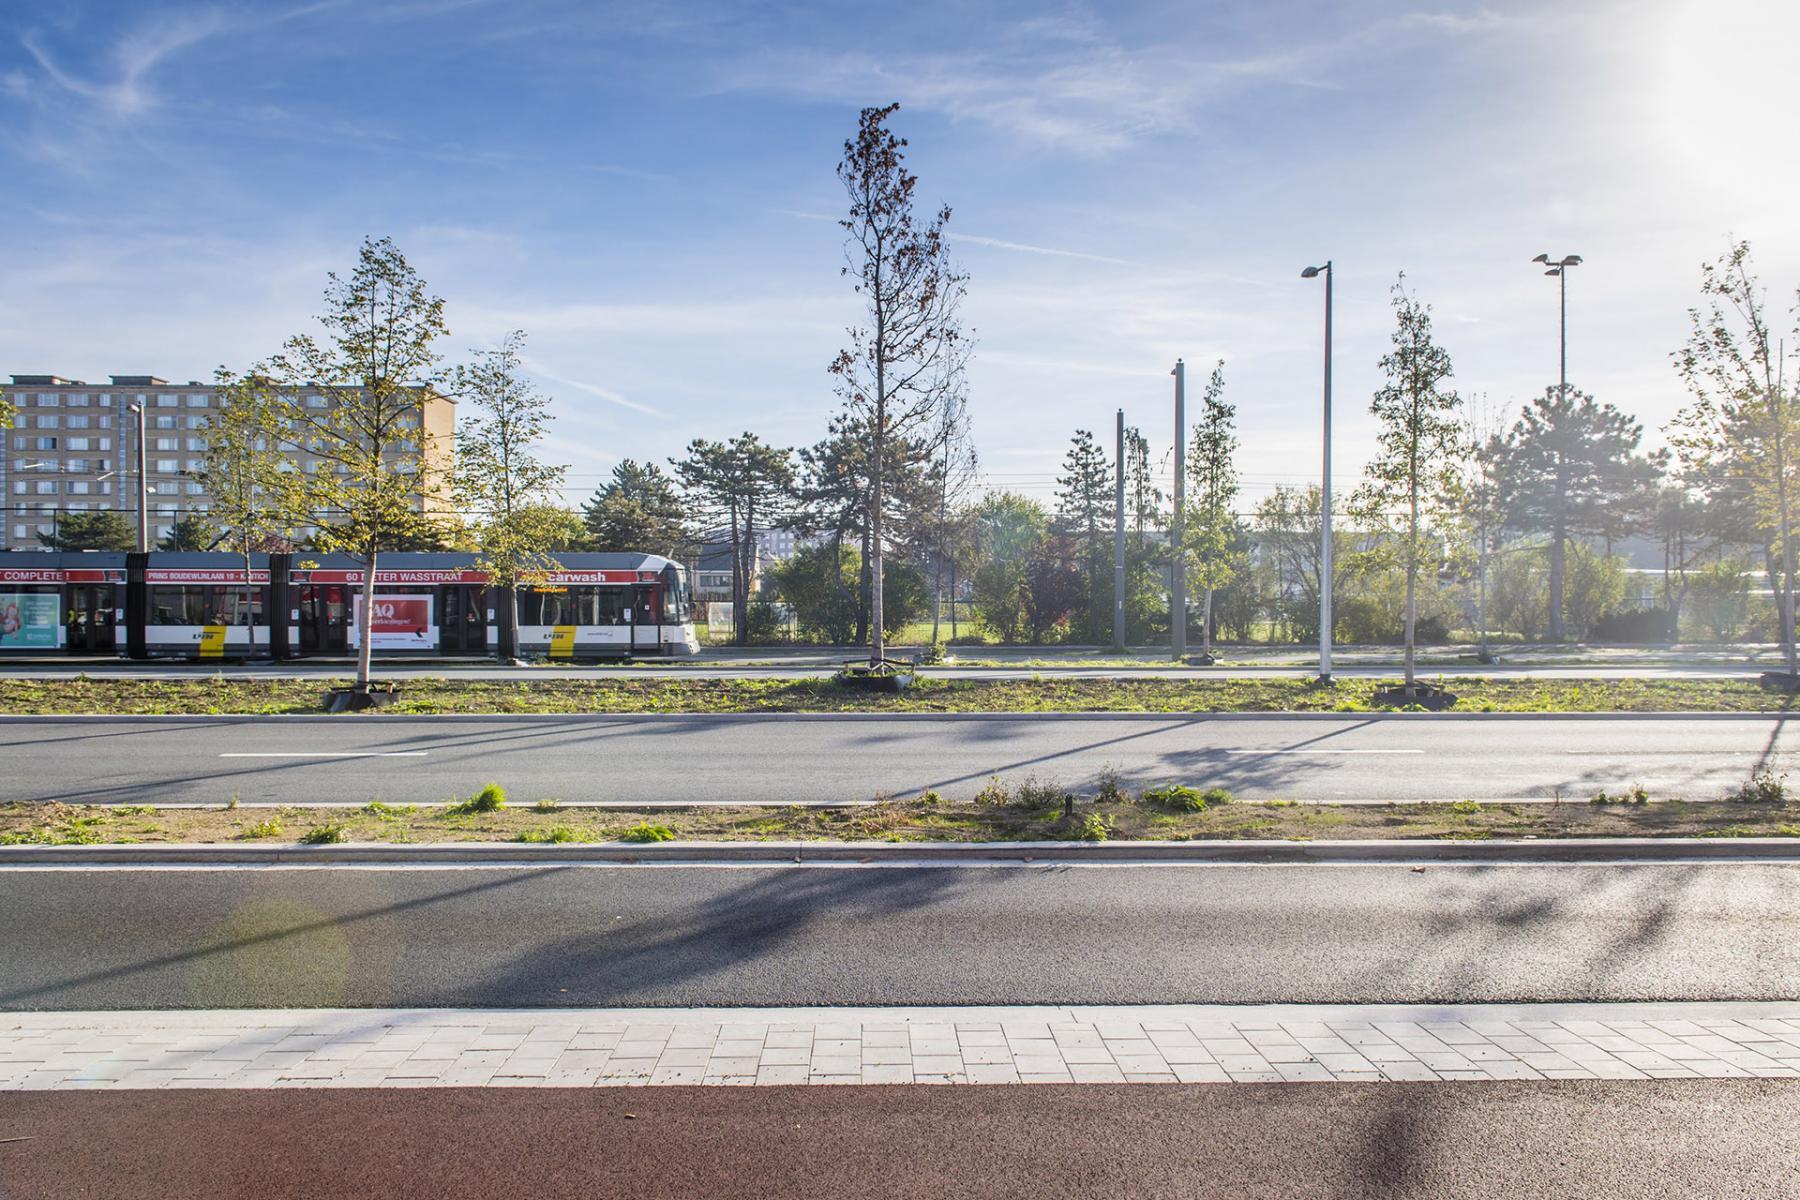 Rijweg met fietspad en trambusbaan